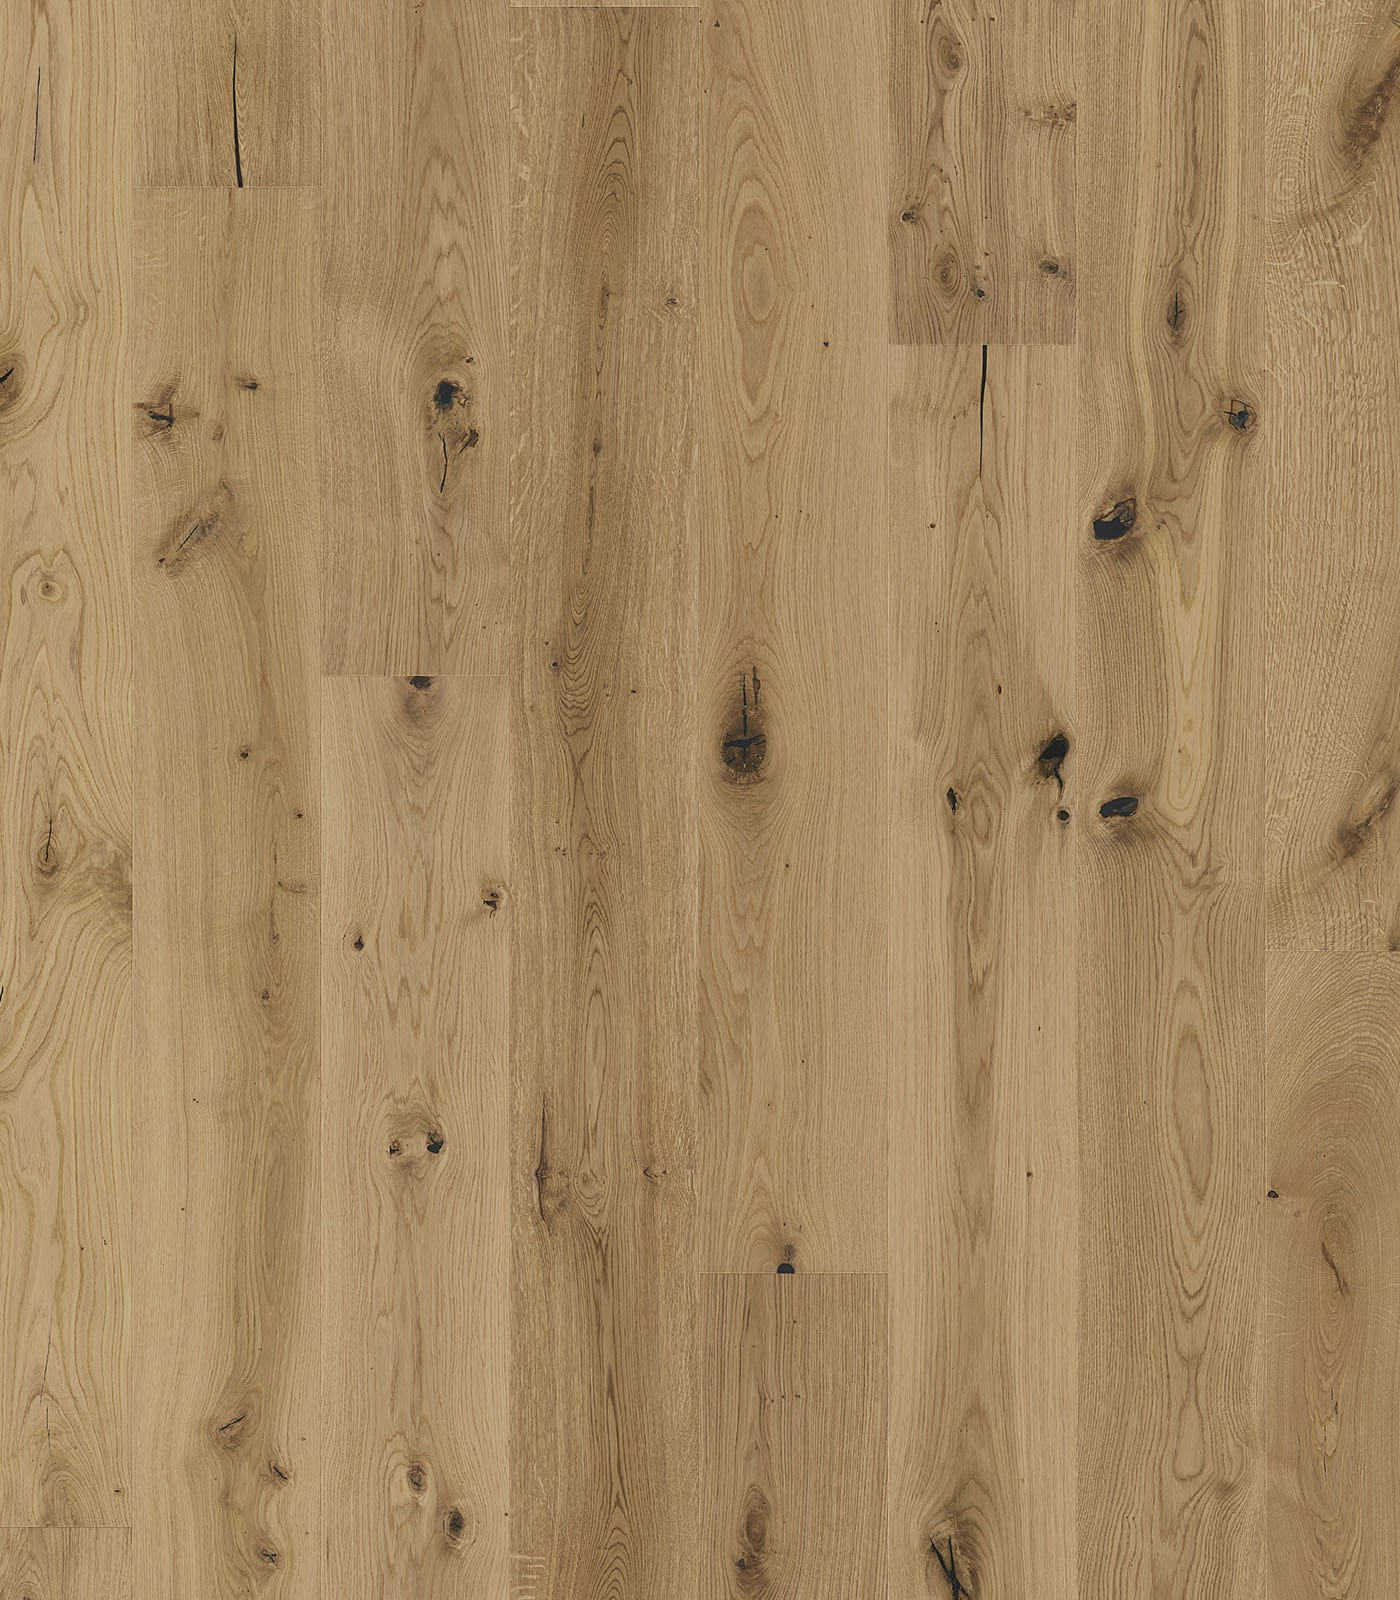 Antique Collection-European Oak floors-flat